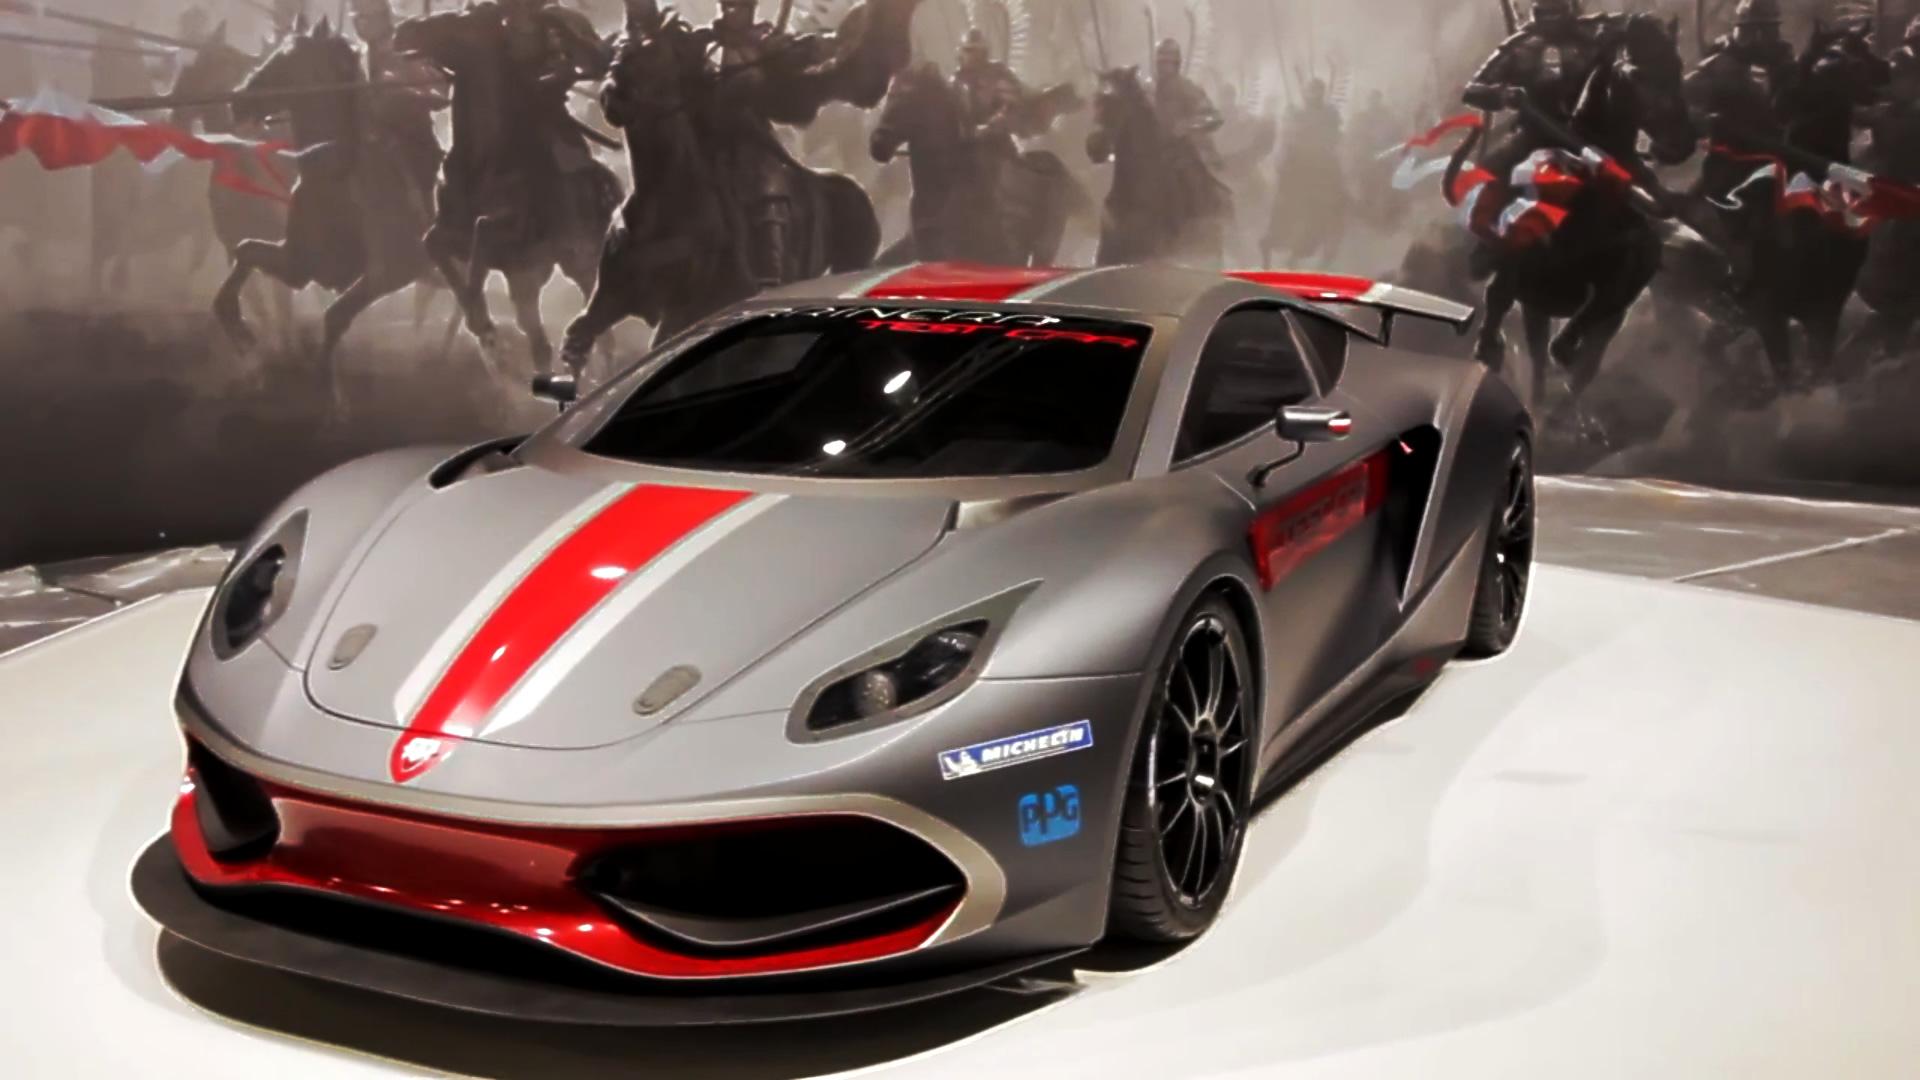 Meet 800 Horse Power Hussarya Arrinera Super Car